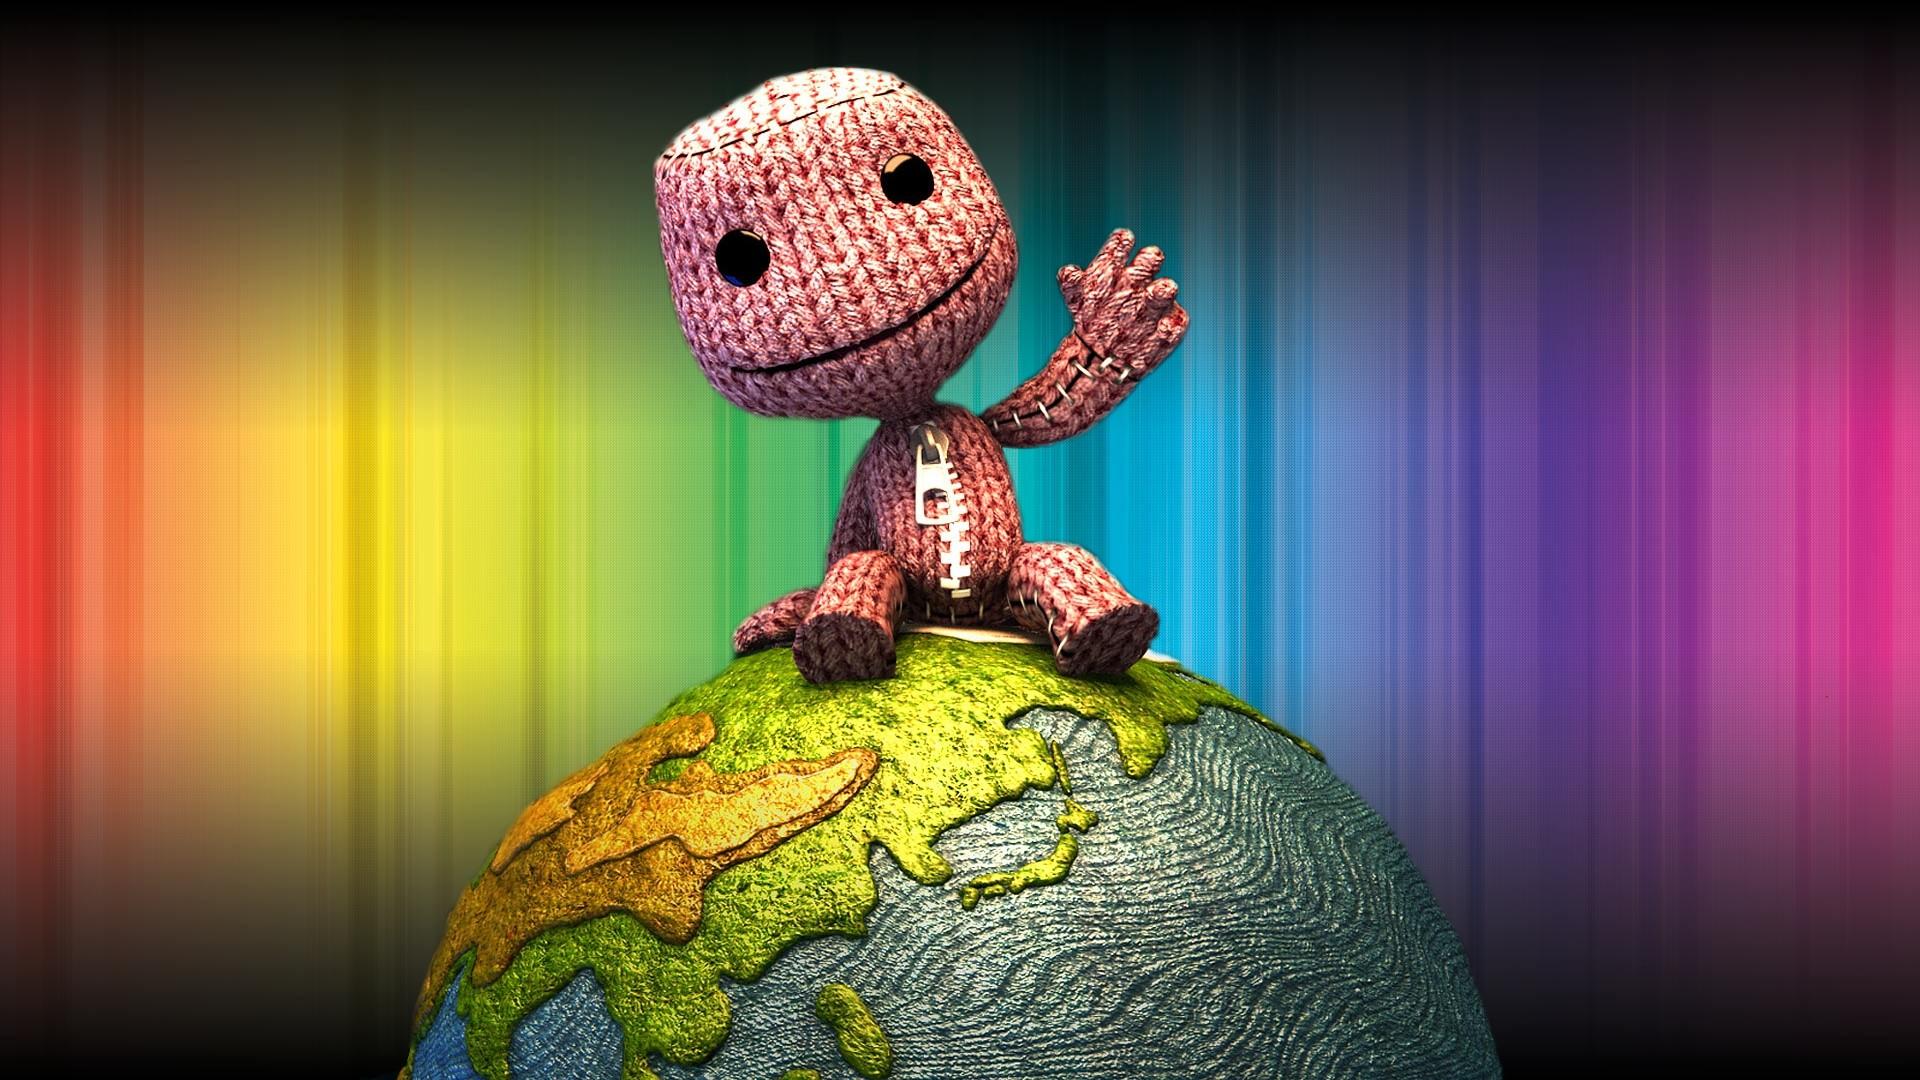 little big planet by megustadeviantart fan art wallpaper games 2012 .